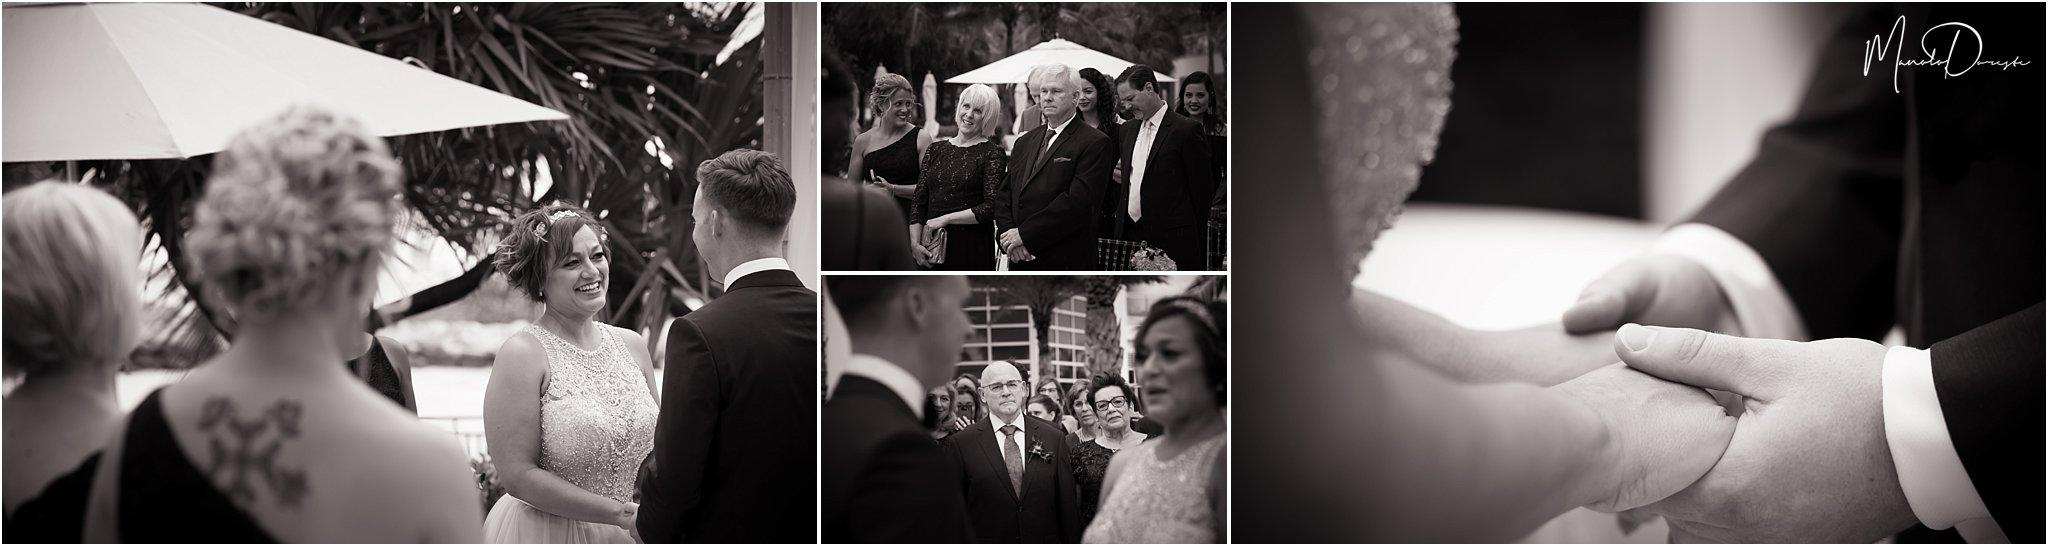 0451_ManoloDoreste_InFocusStudios_Wedding_Family_Photography_Miami_MiamiPhotographer.jpg